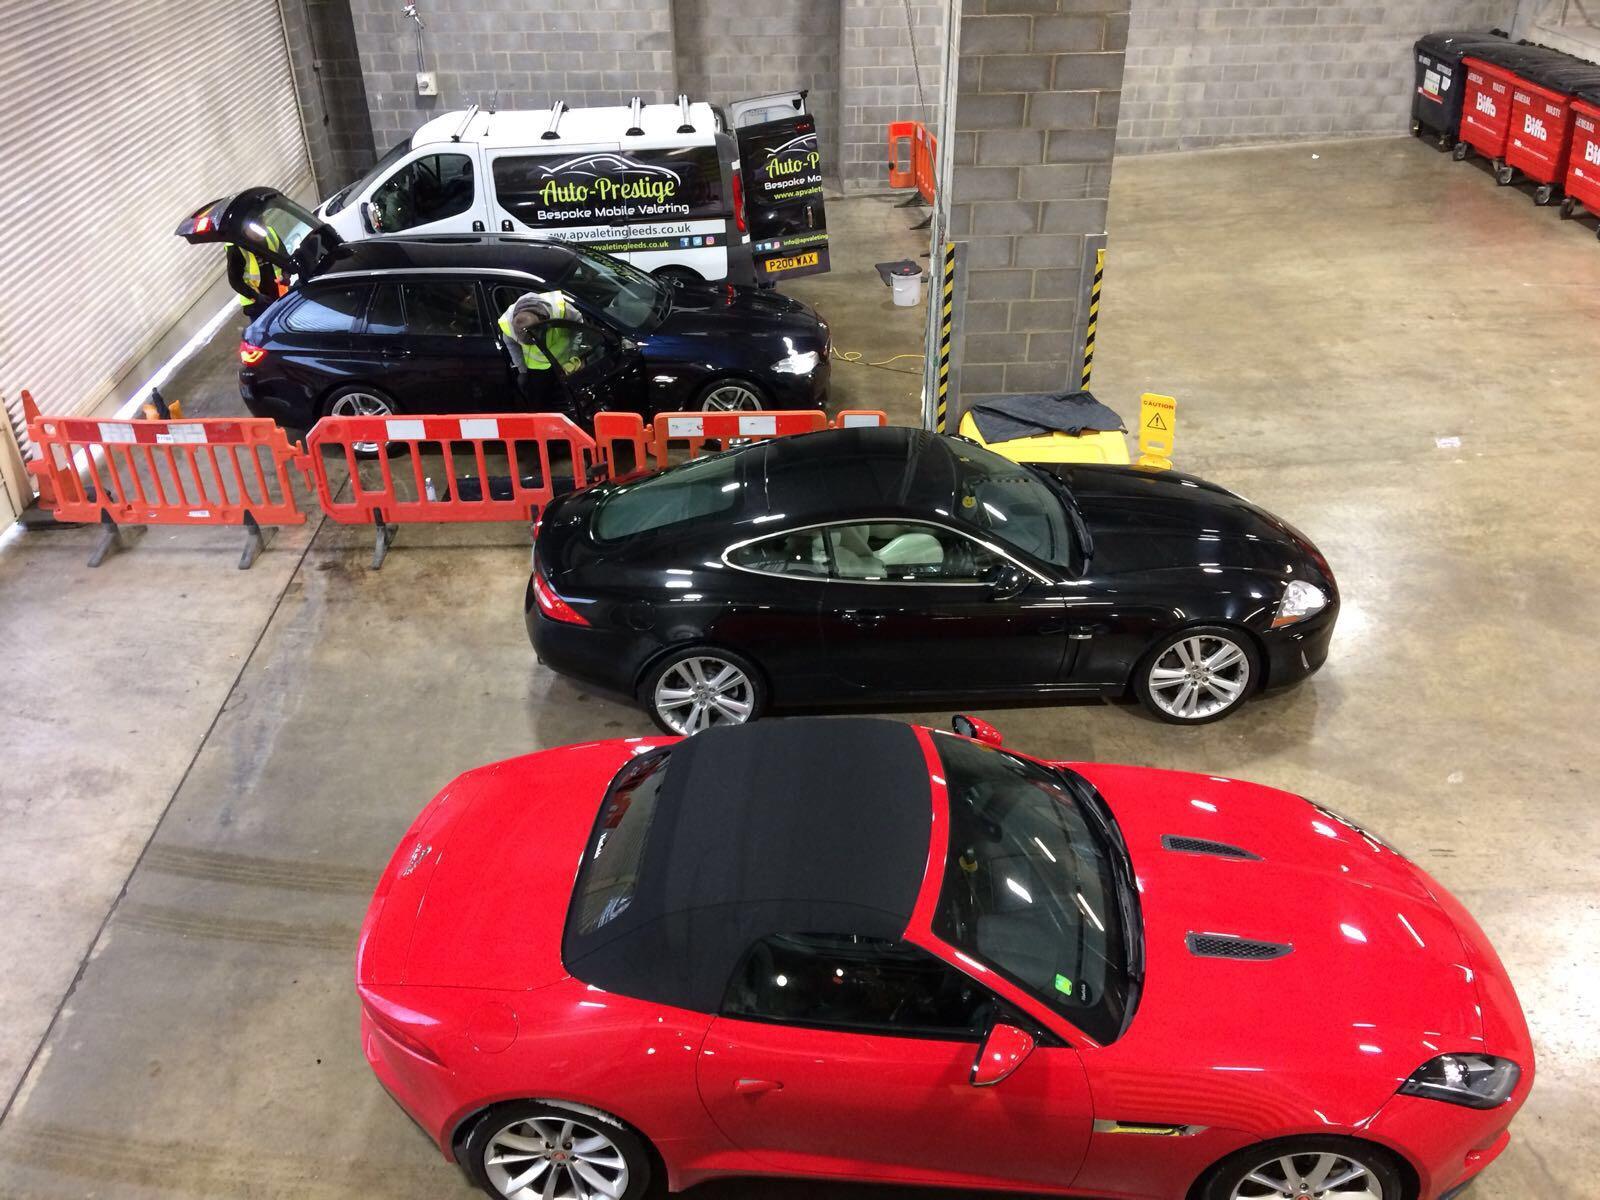 d18ec573a367 Auto Prestige Onsite Valeting